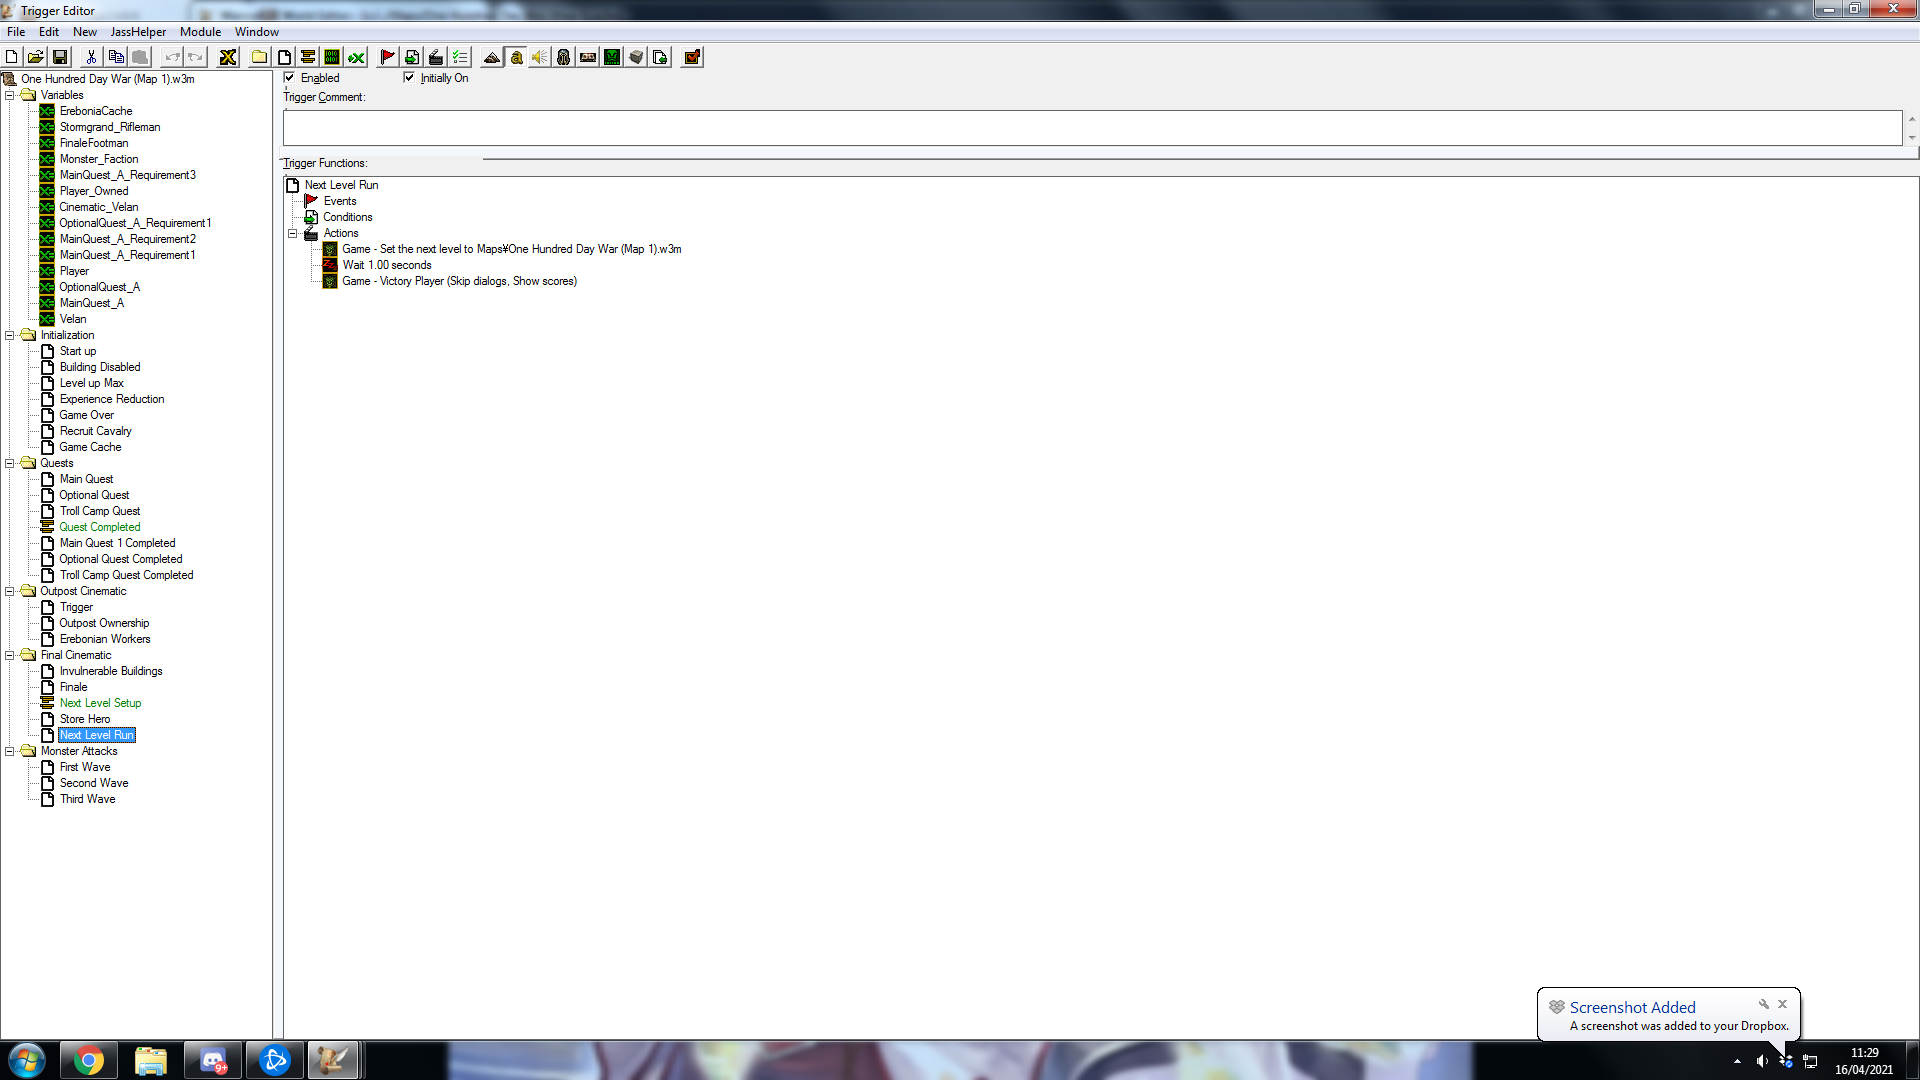 Screenshot 2021-04-16 11.29.08.png